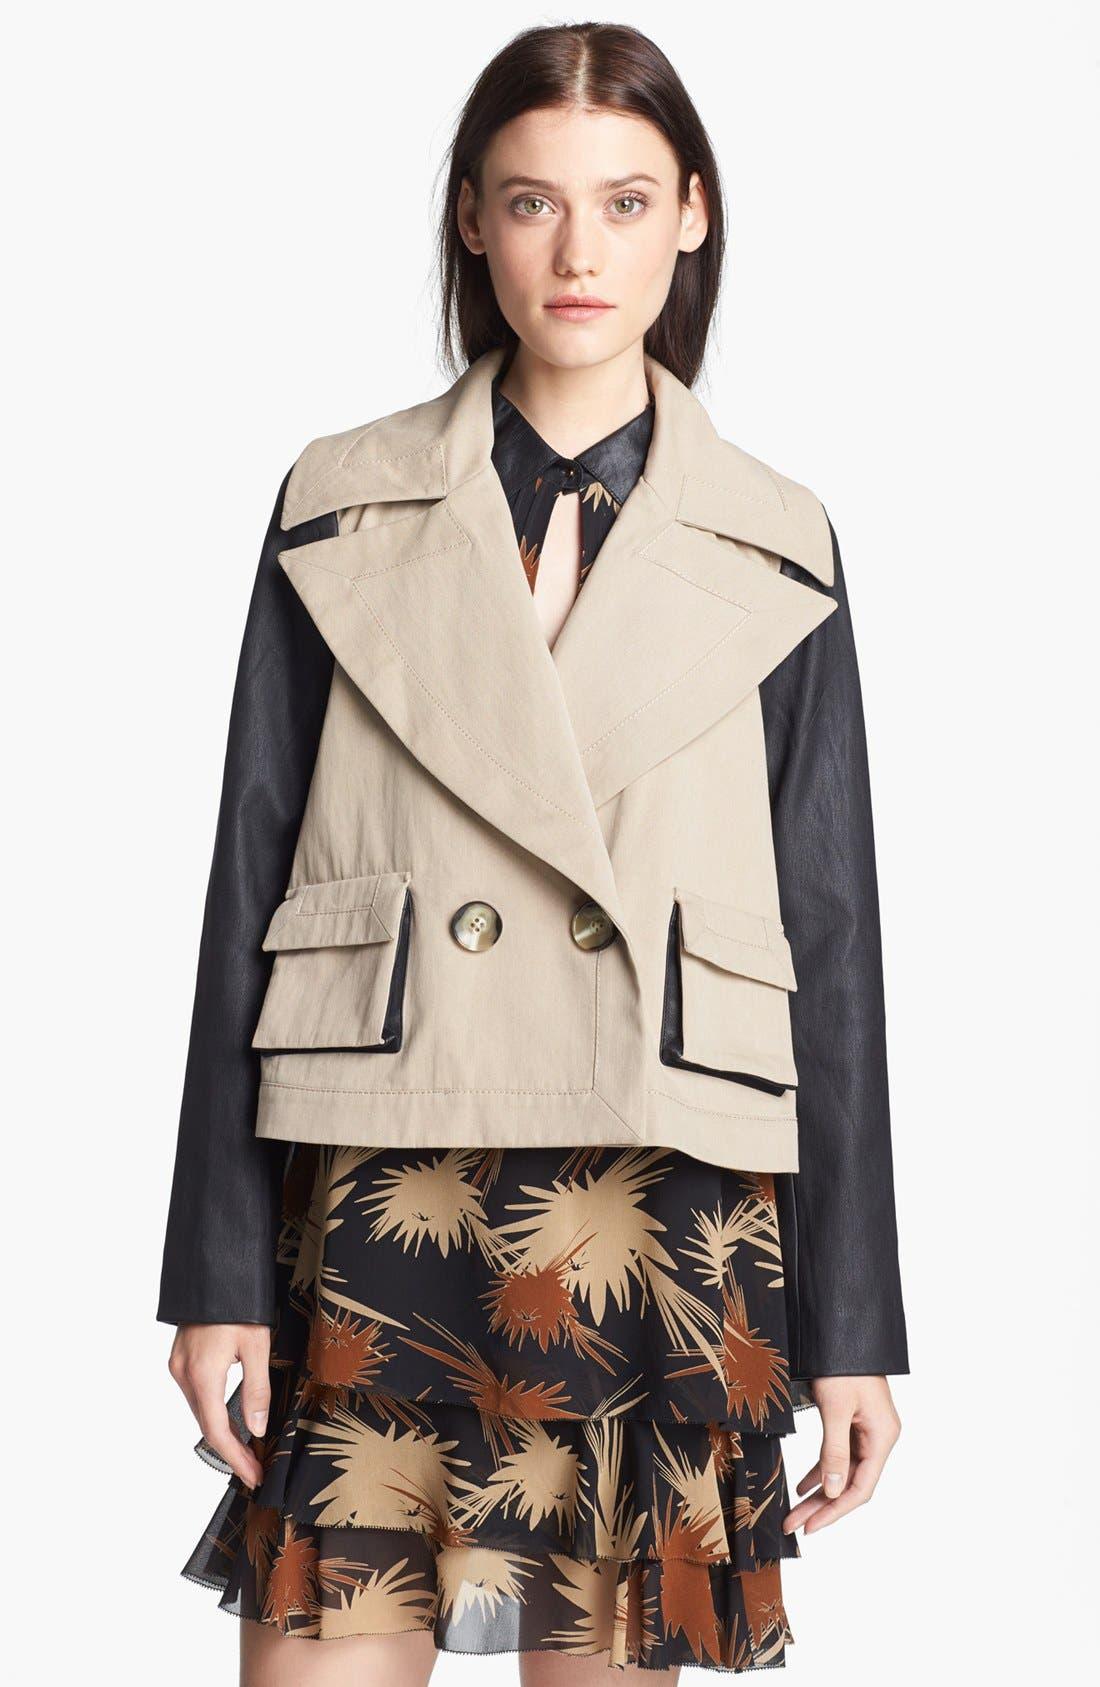 Alternate Image 1 Selected - Rachel Zoe 'Keira' Crop Jacket